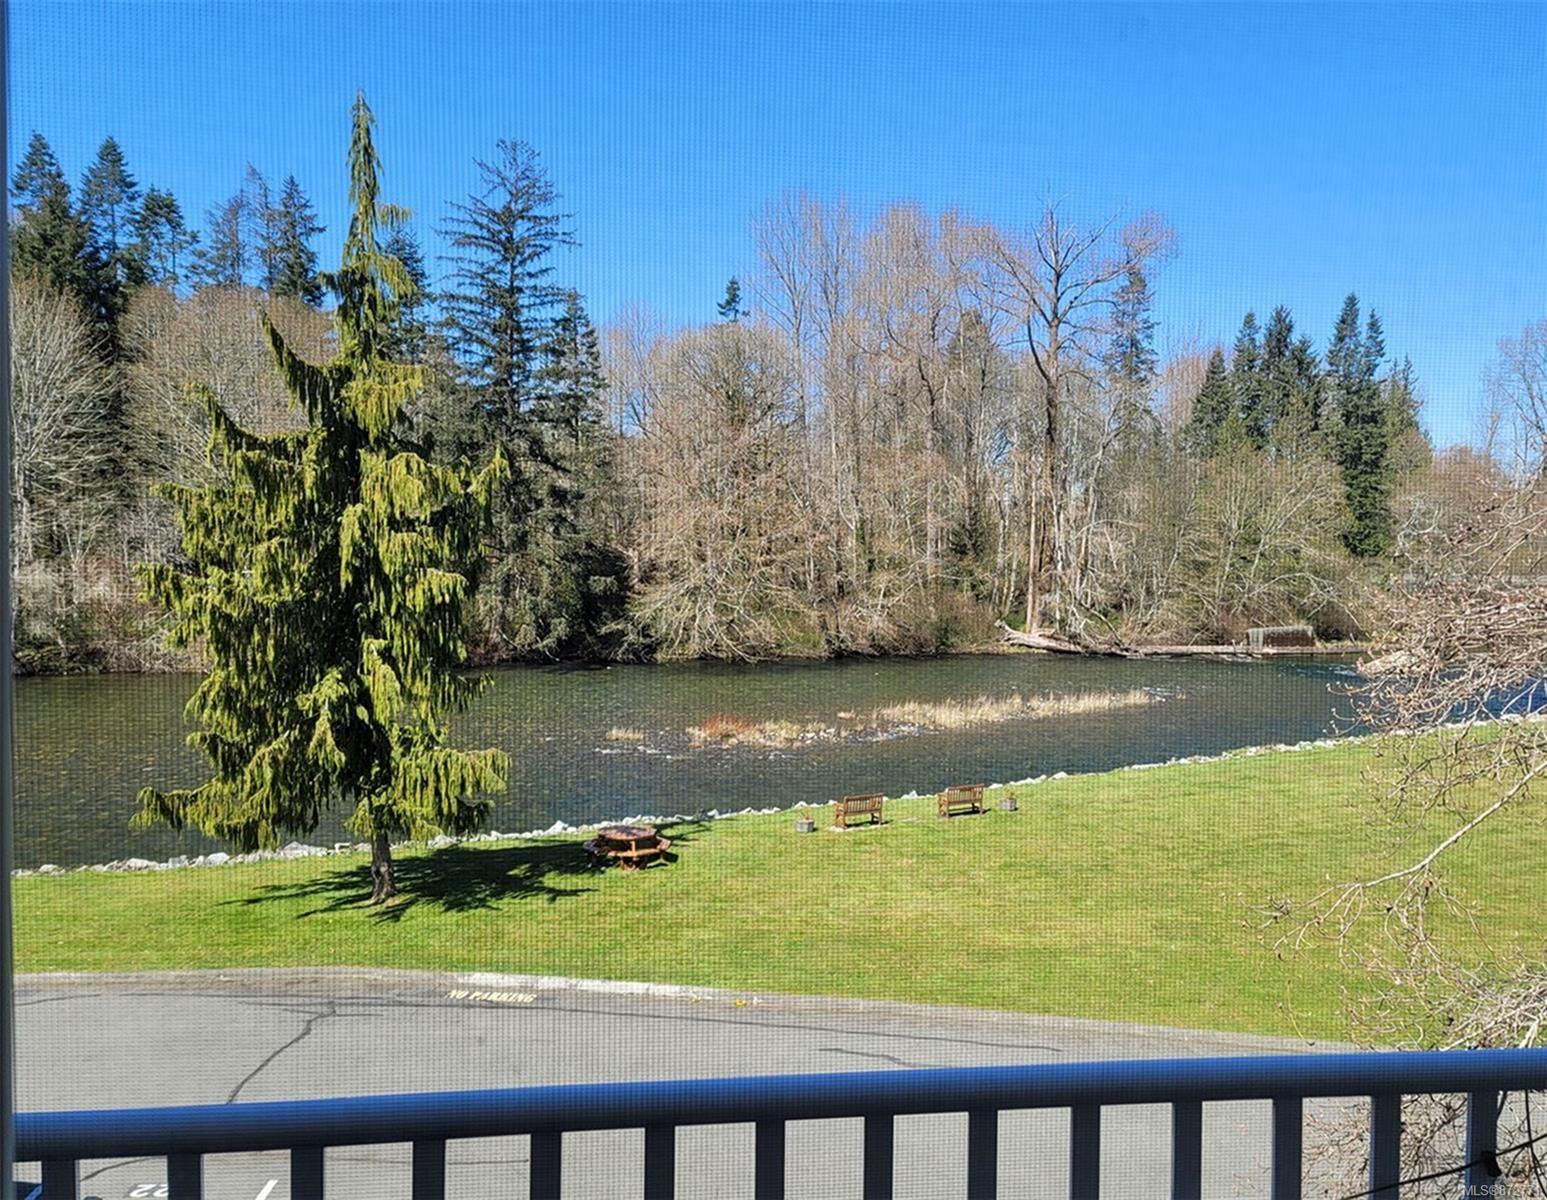 Photo 3: Photos: 305 205 1st St in : CV Courtenay City Condo for sale (Comox Valley)  : MLS®# 872771